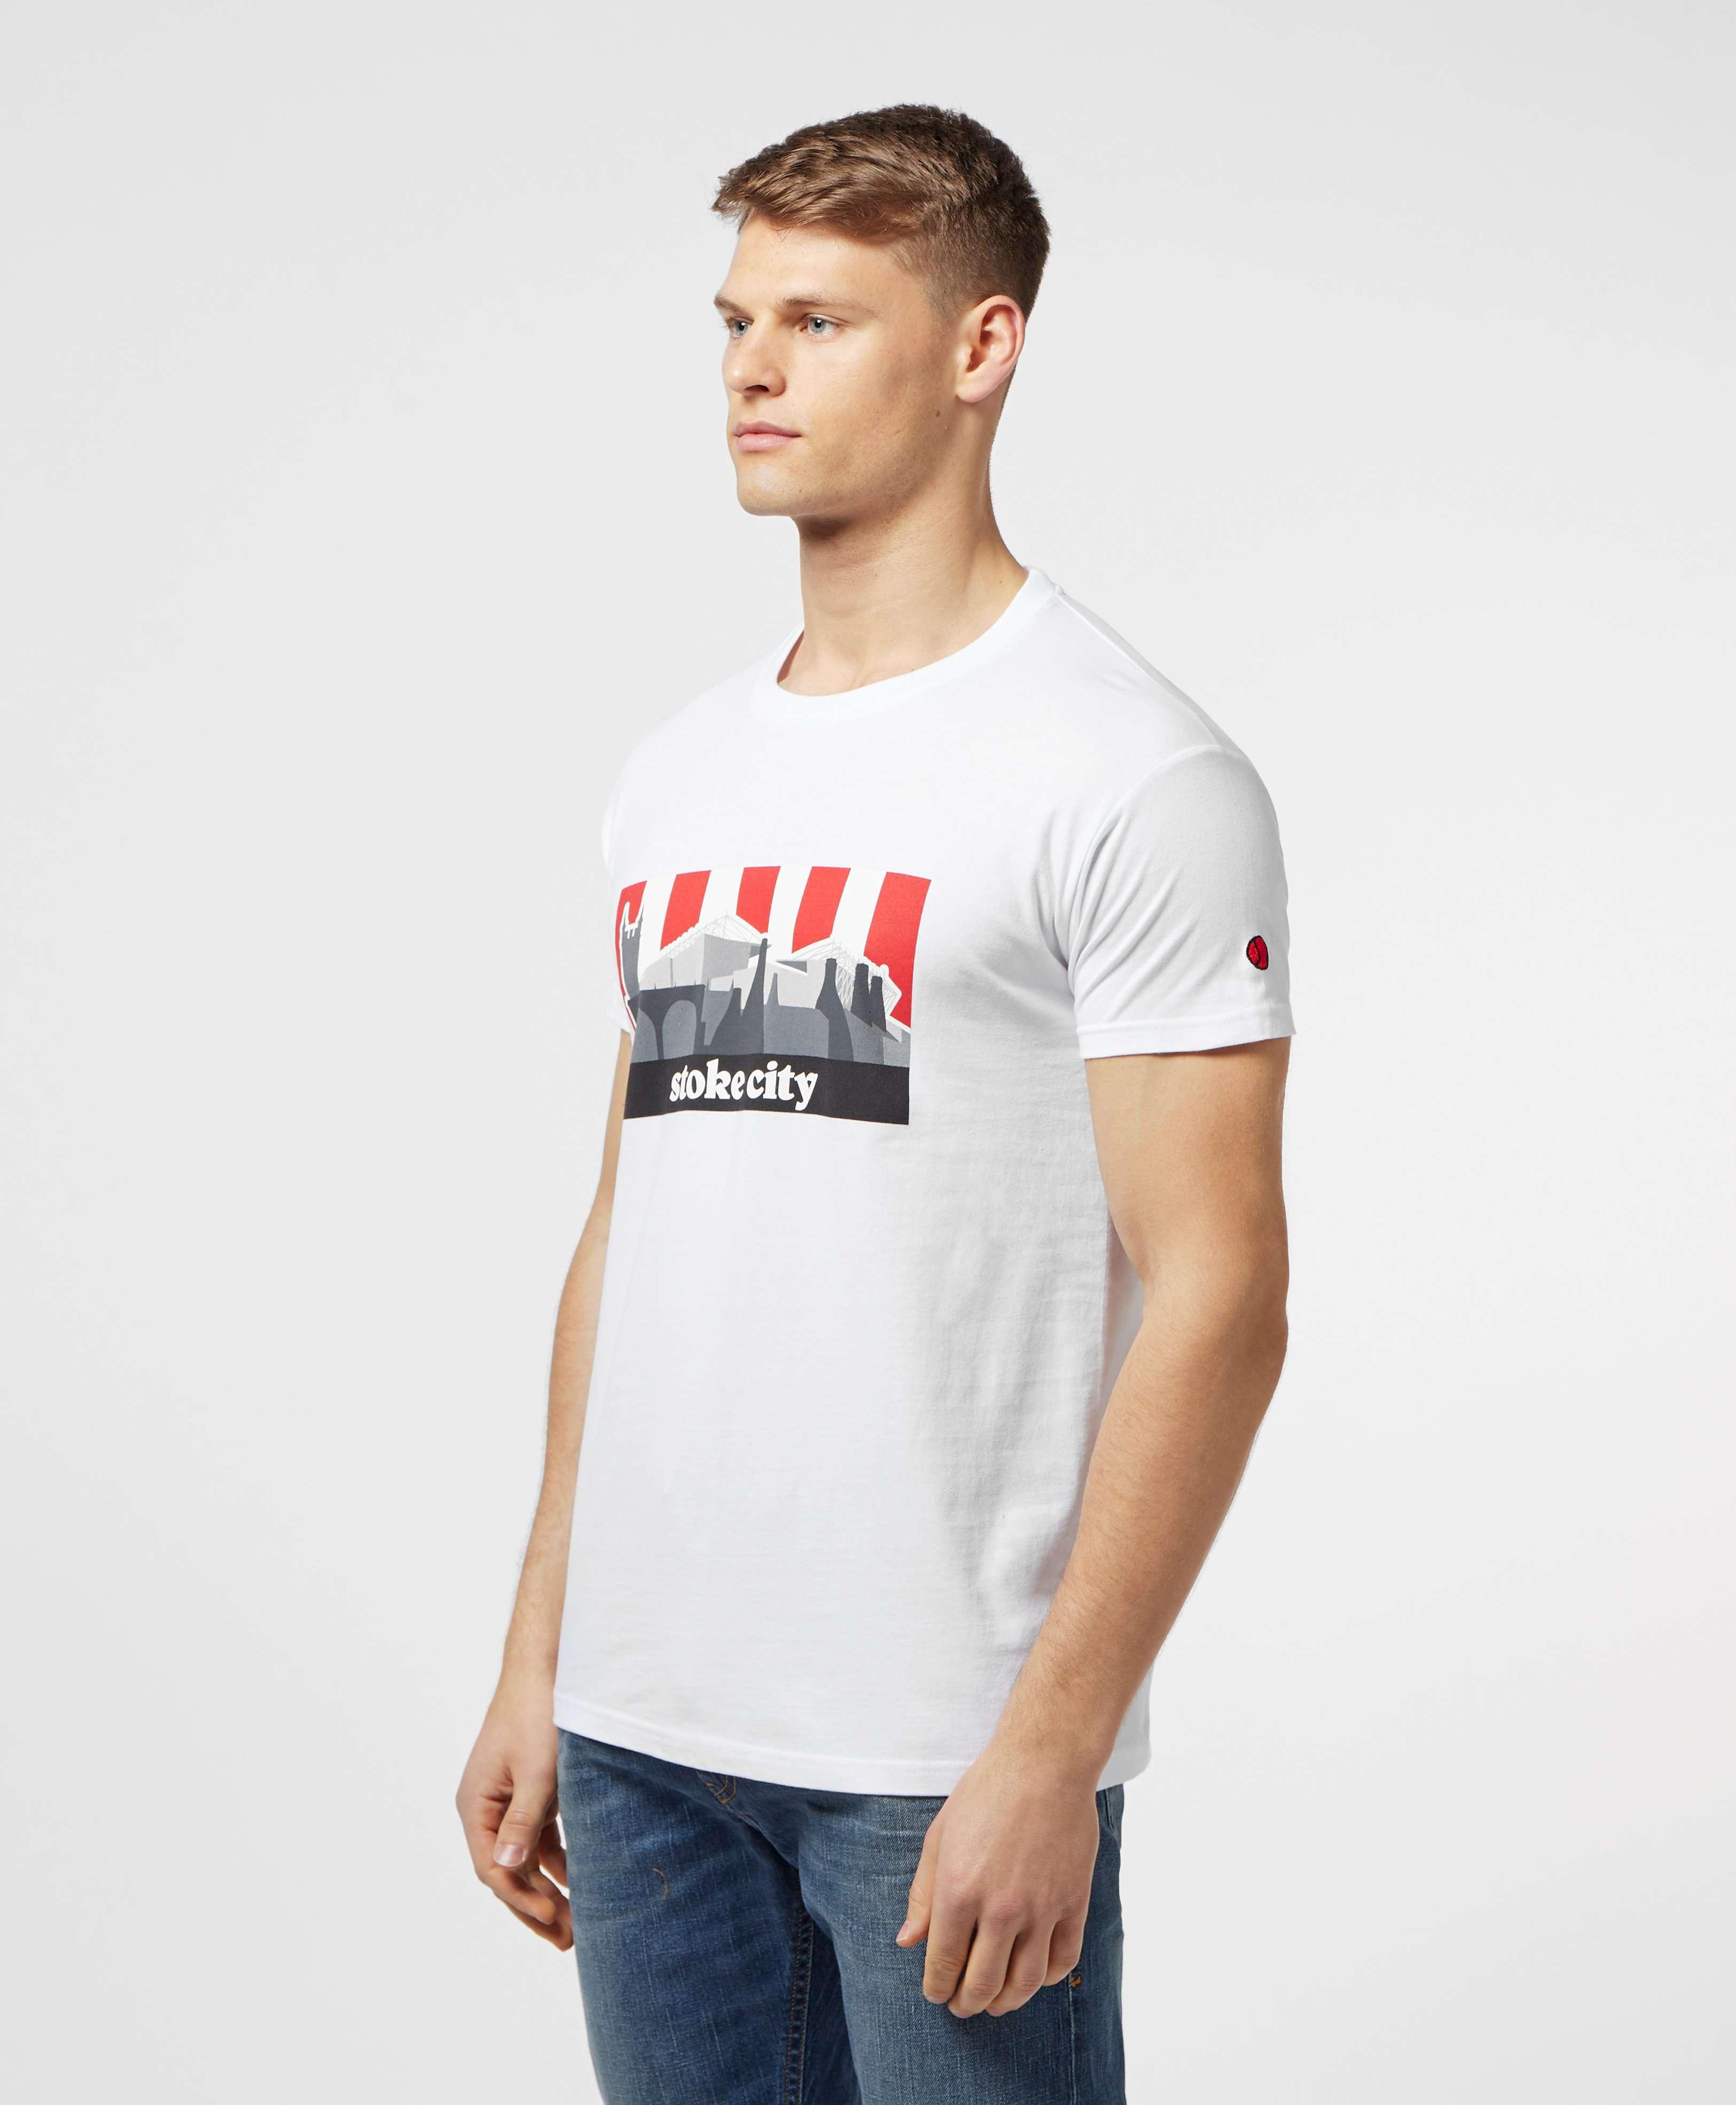 80s Casuals Stoke City Short Sleeve T-Shirt